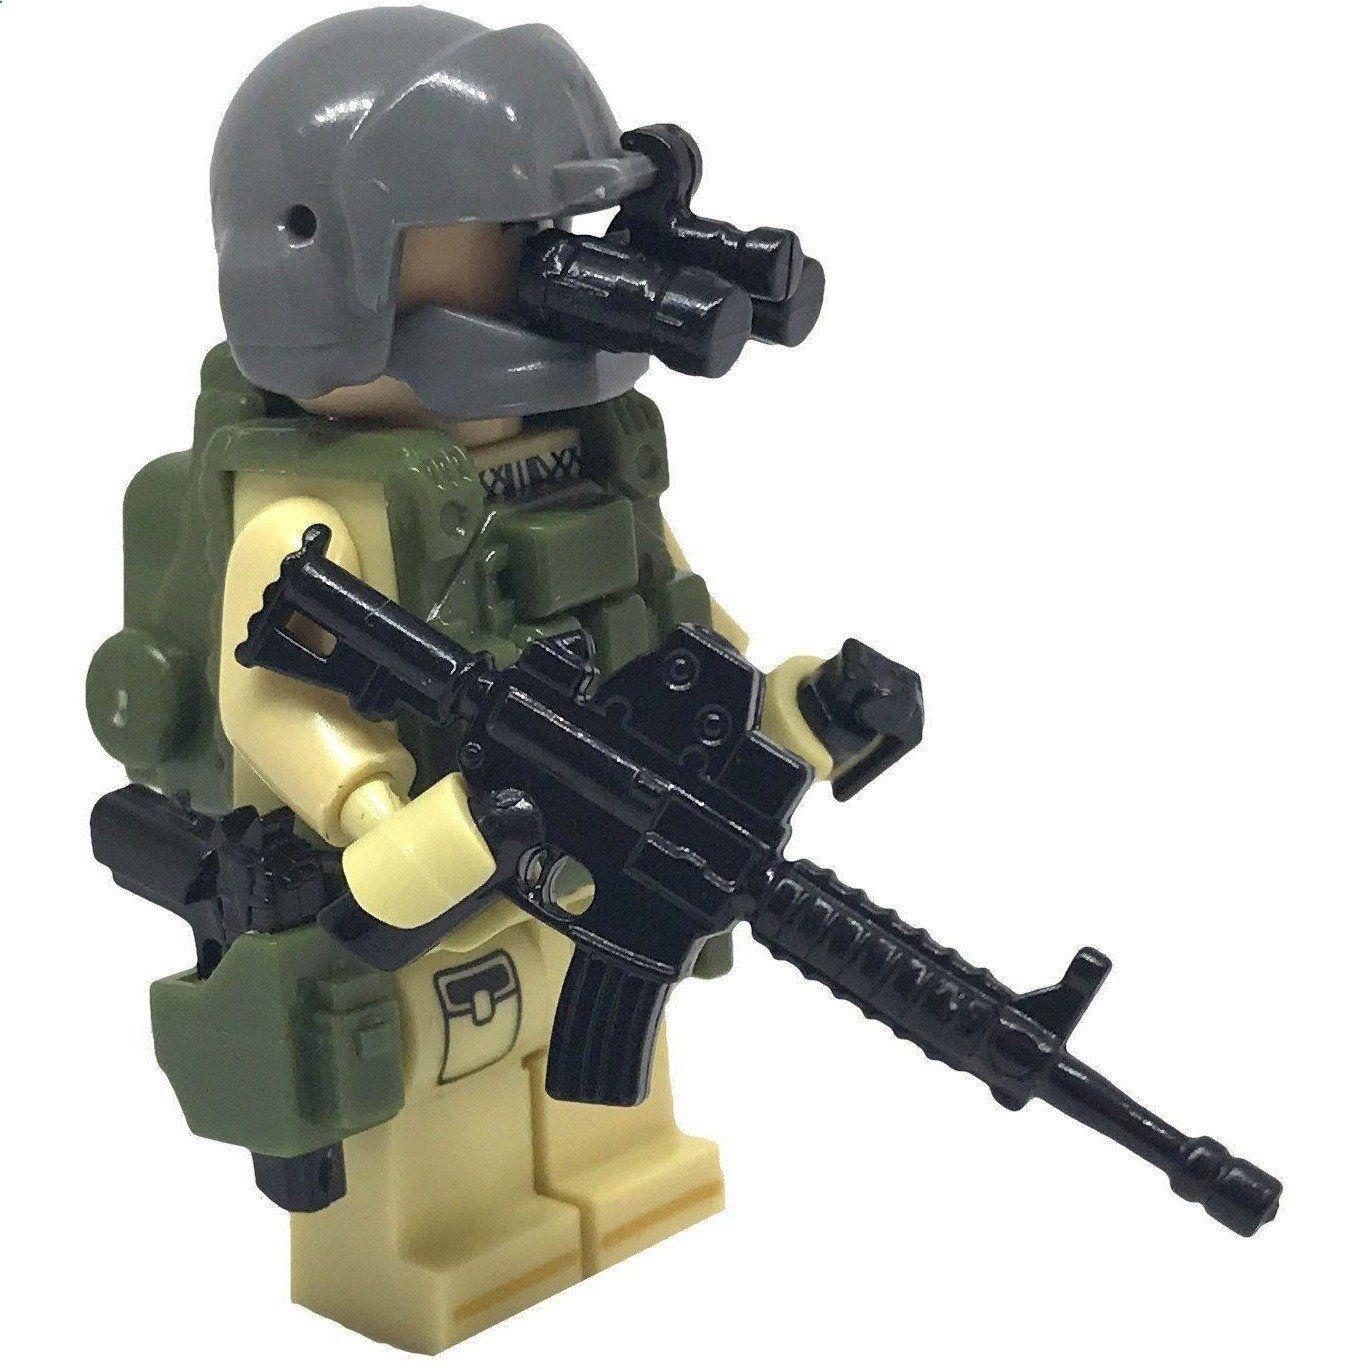 Brick Minifigure United States Air Force (USAF) Pararescue